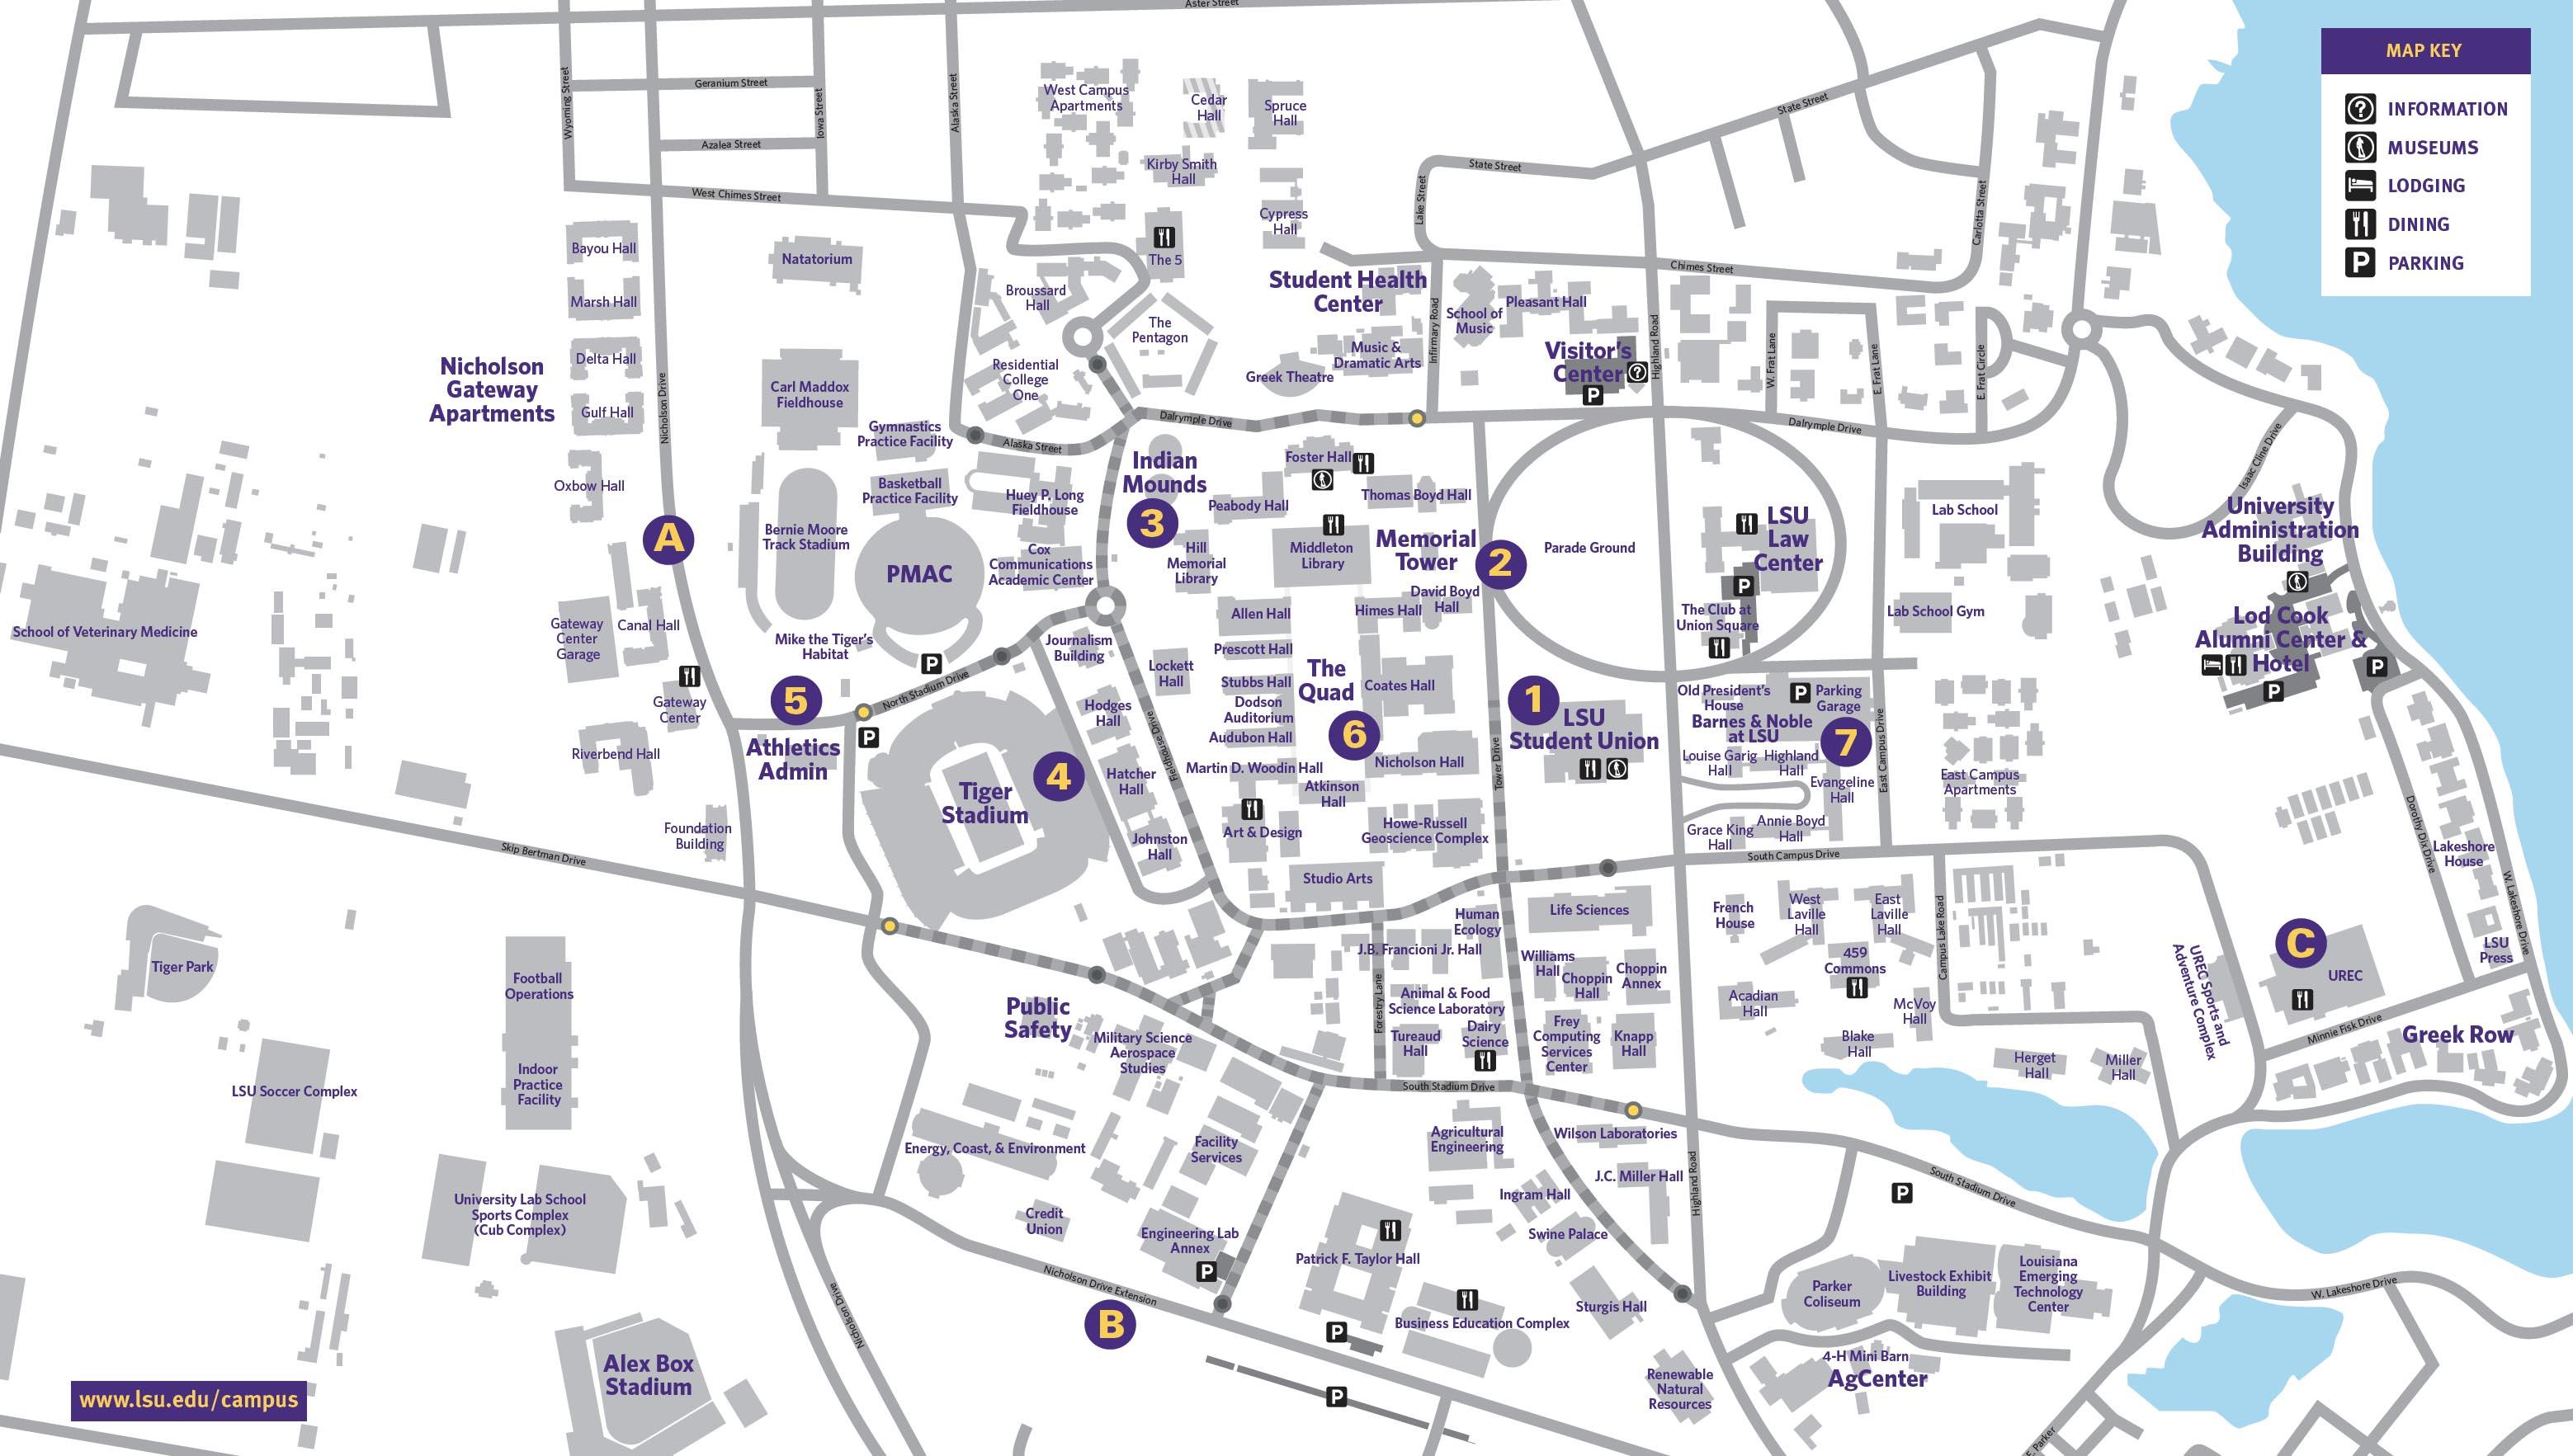 Allen High School Campus Map